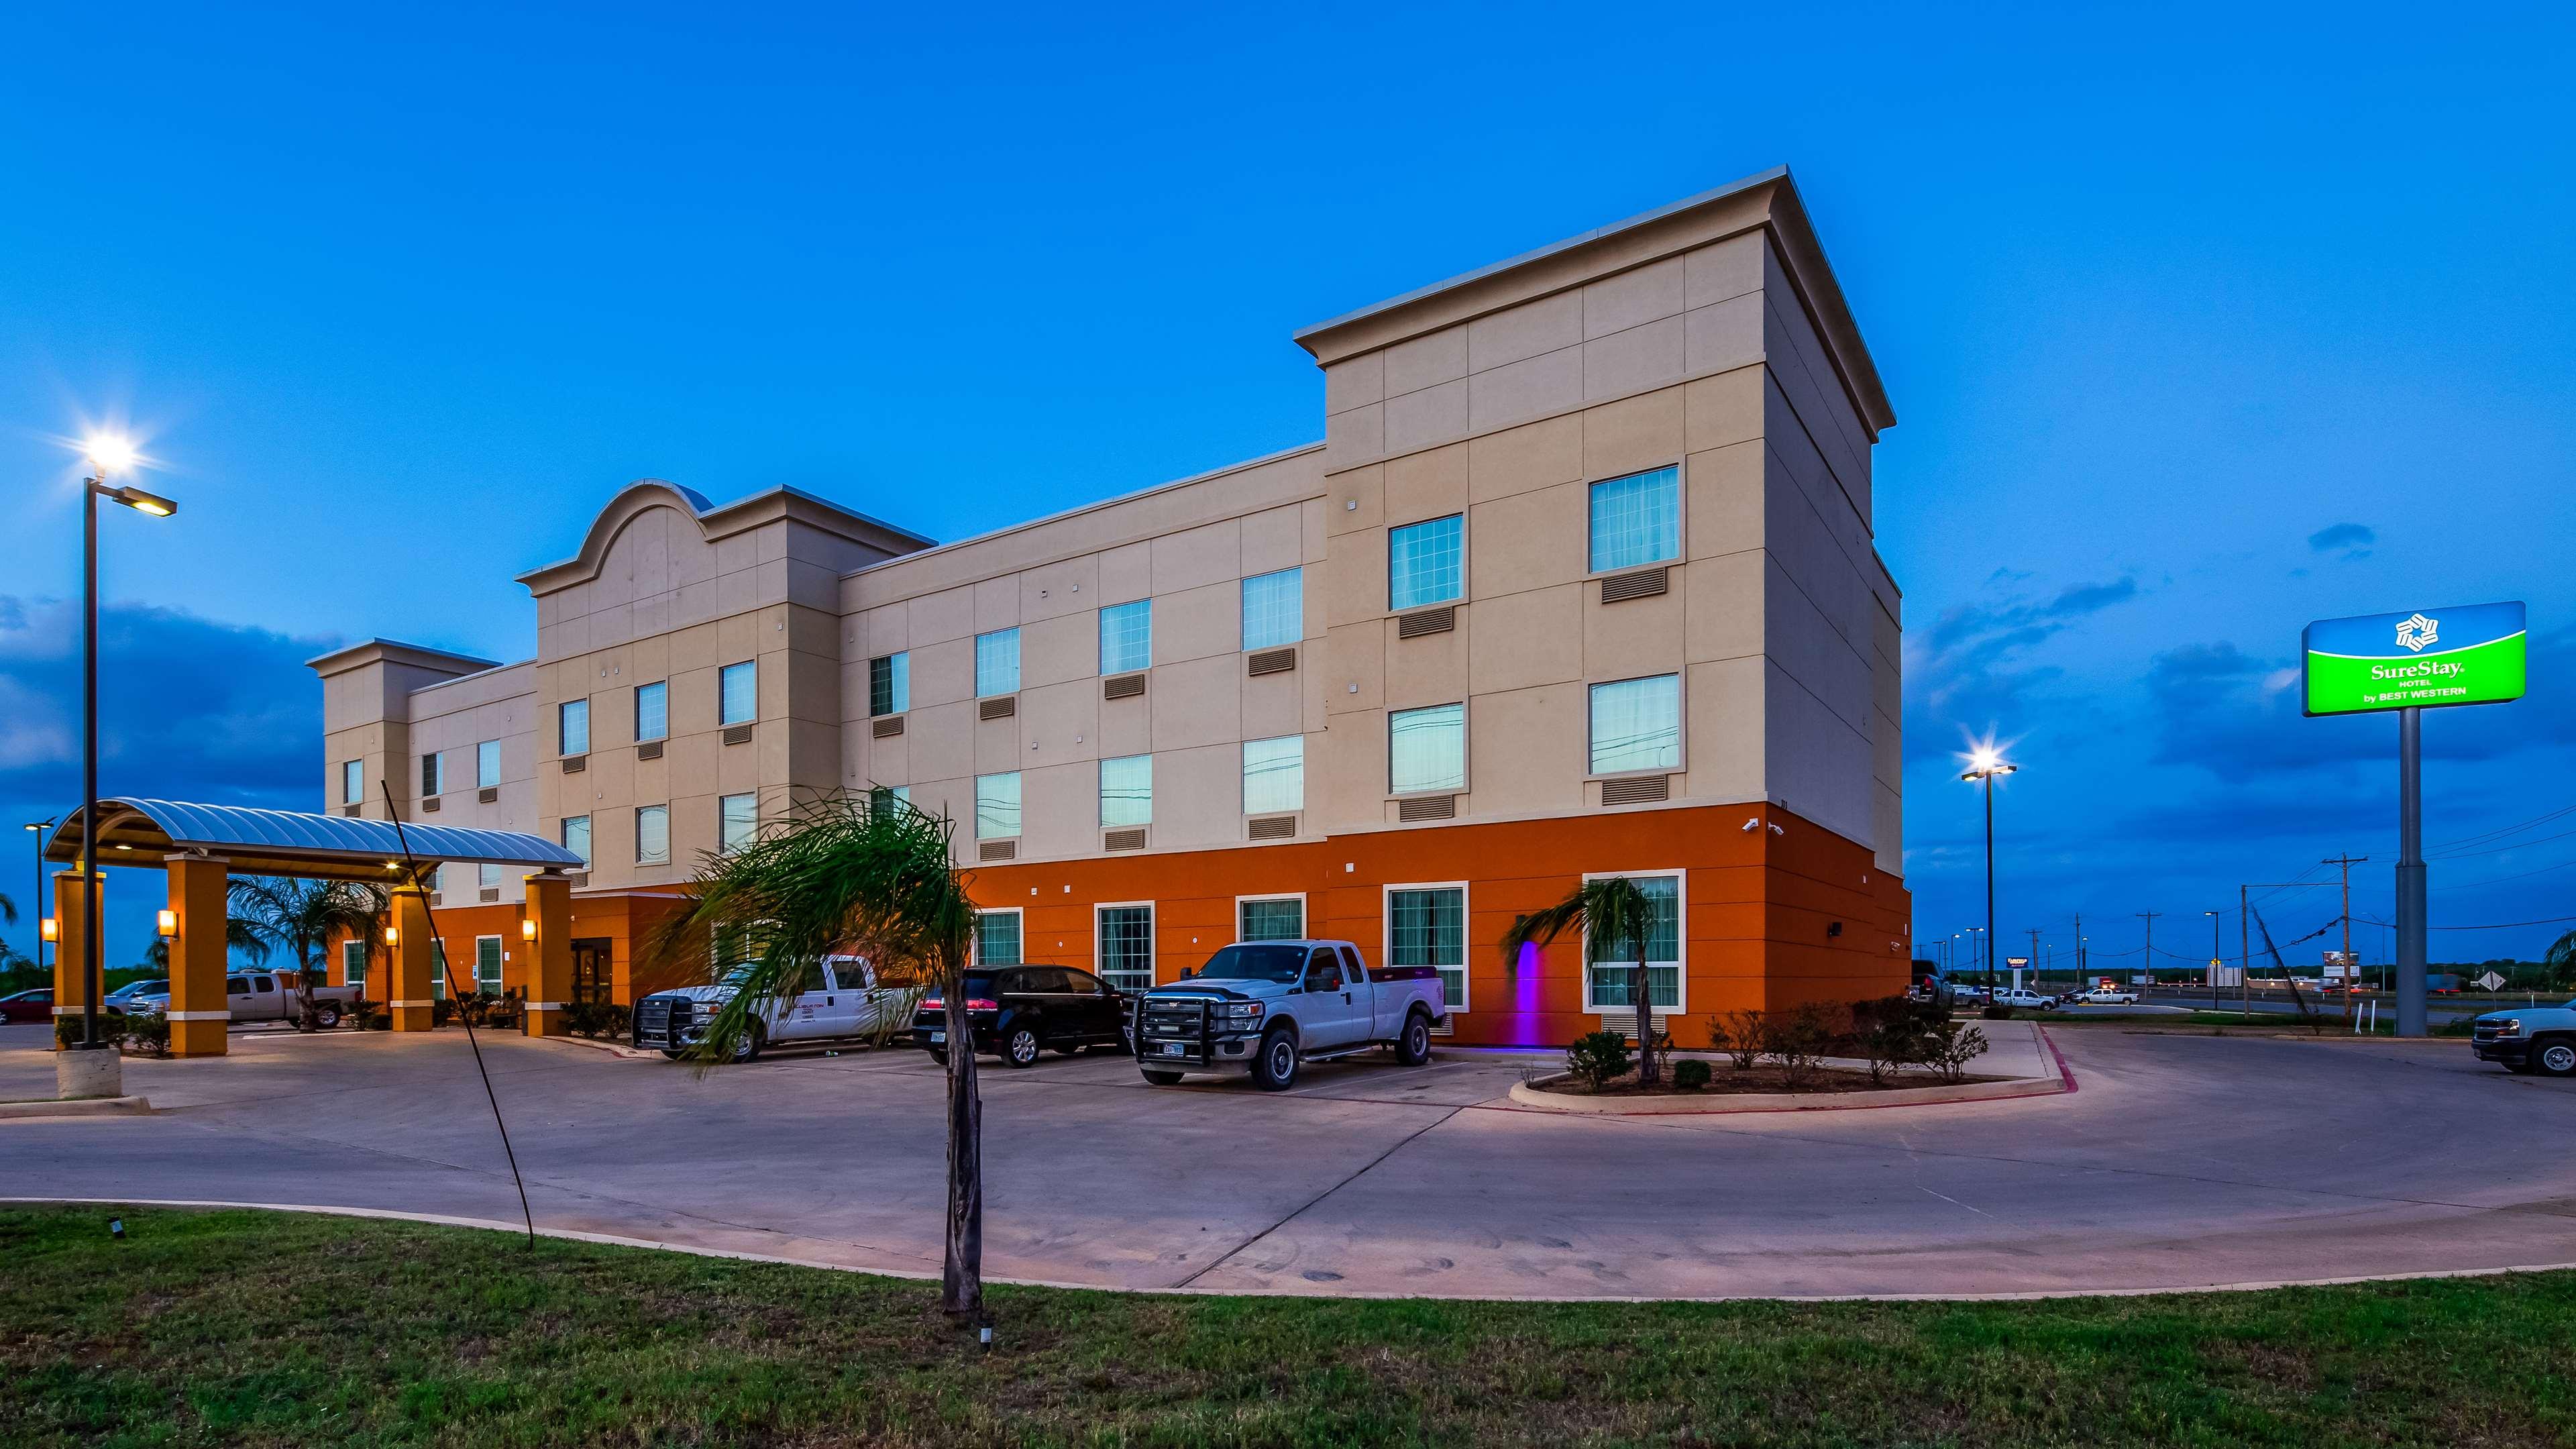 SureStay Hotel by Best Western Cotulla image 2